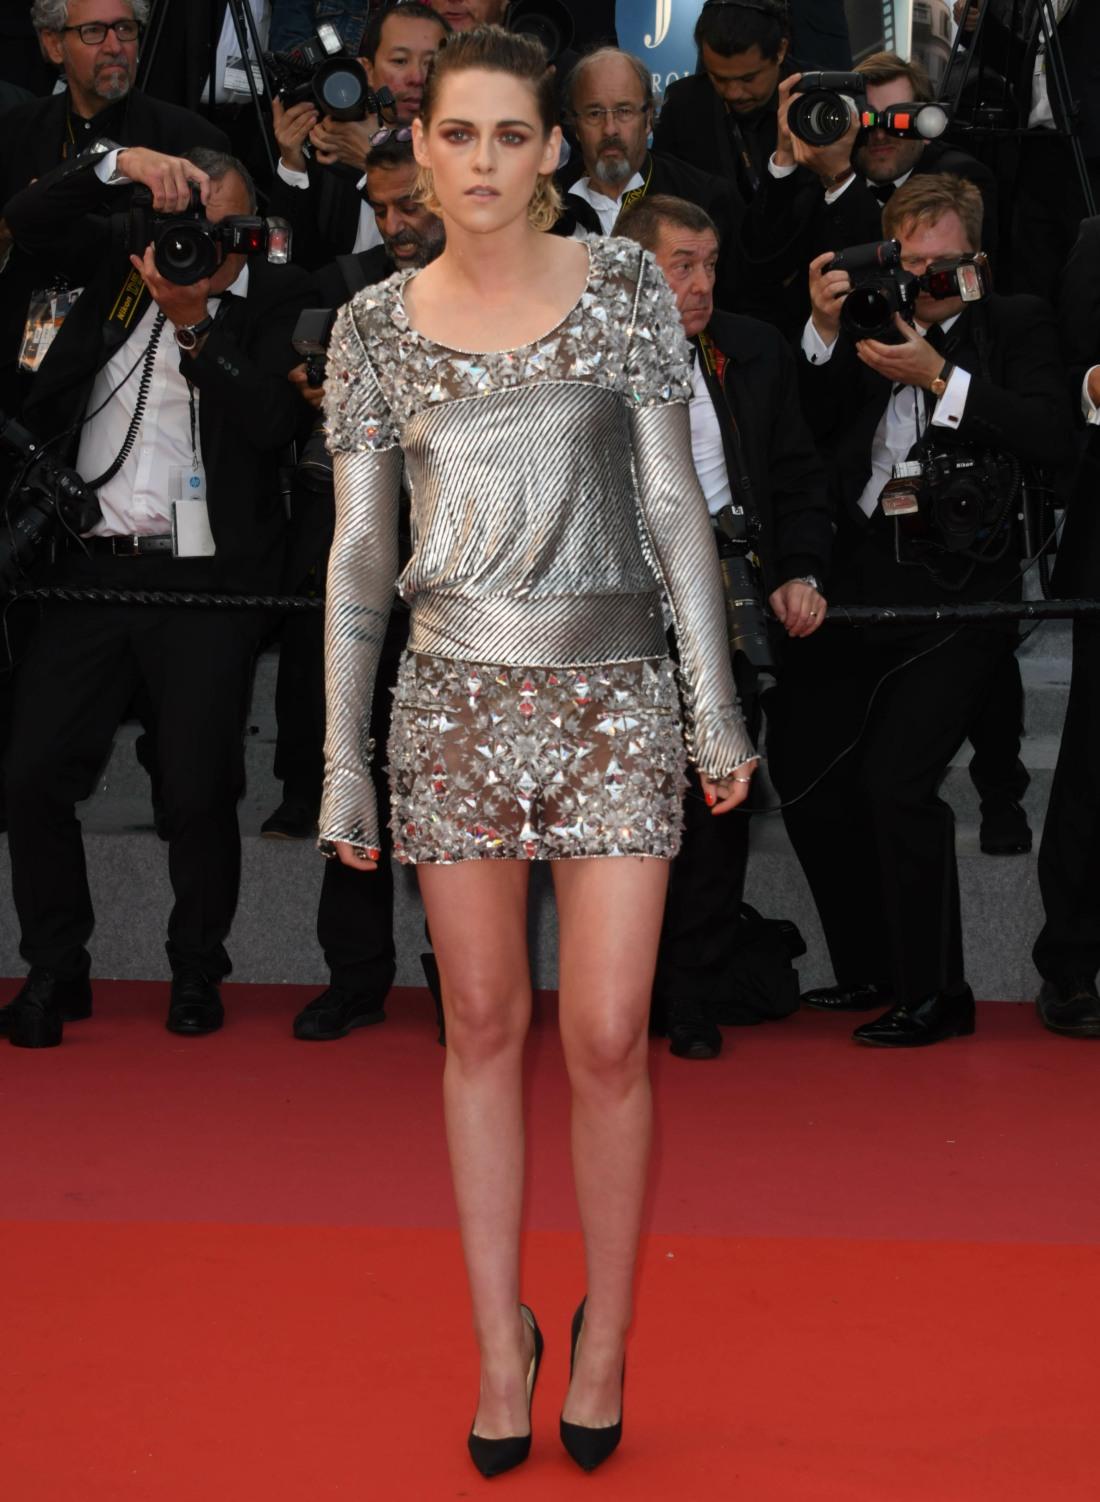 71st annual Cannes Film Festival - BlacKkKlansman - Premiere